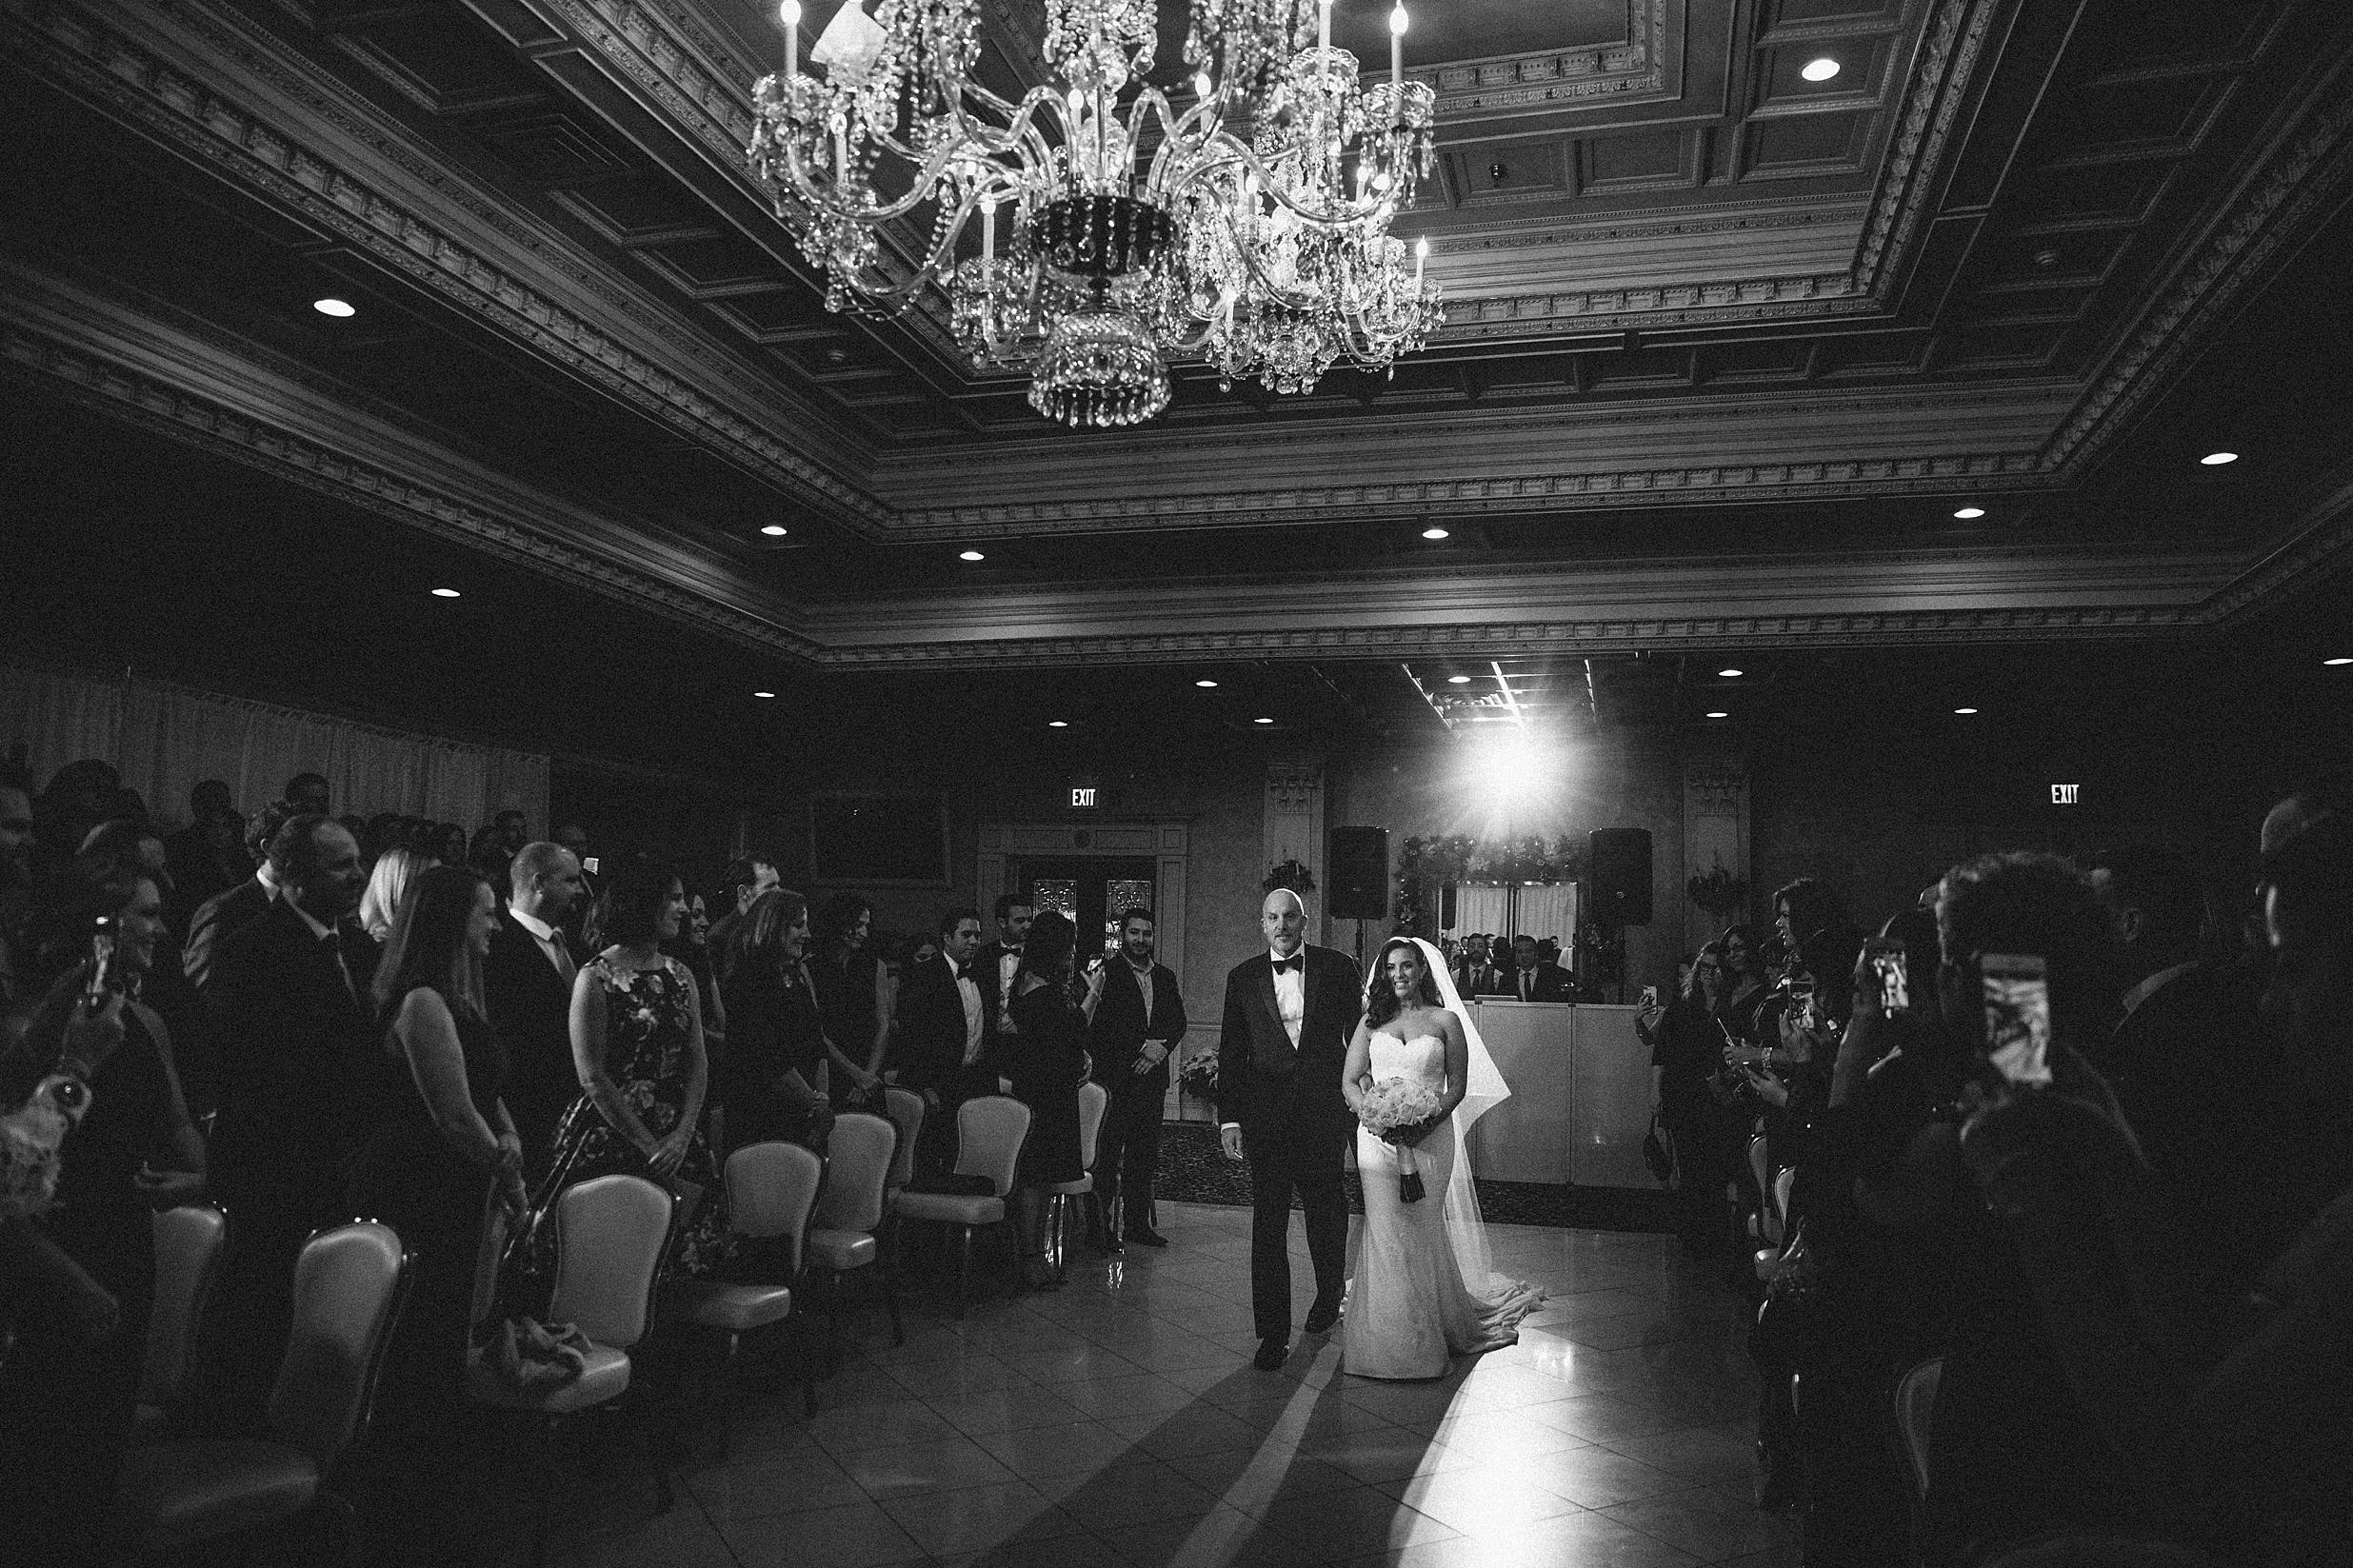 winter-wedding-snow-indoor-ceremony-nj-photographer_0025.jpg